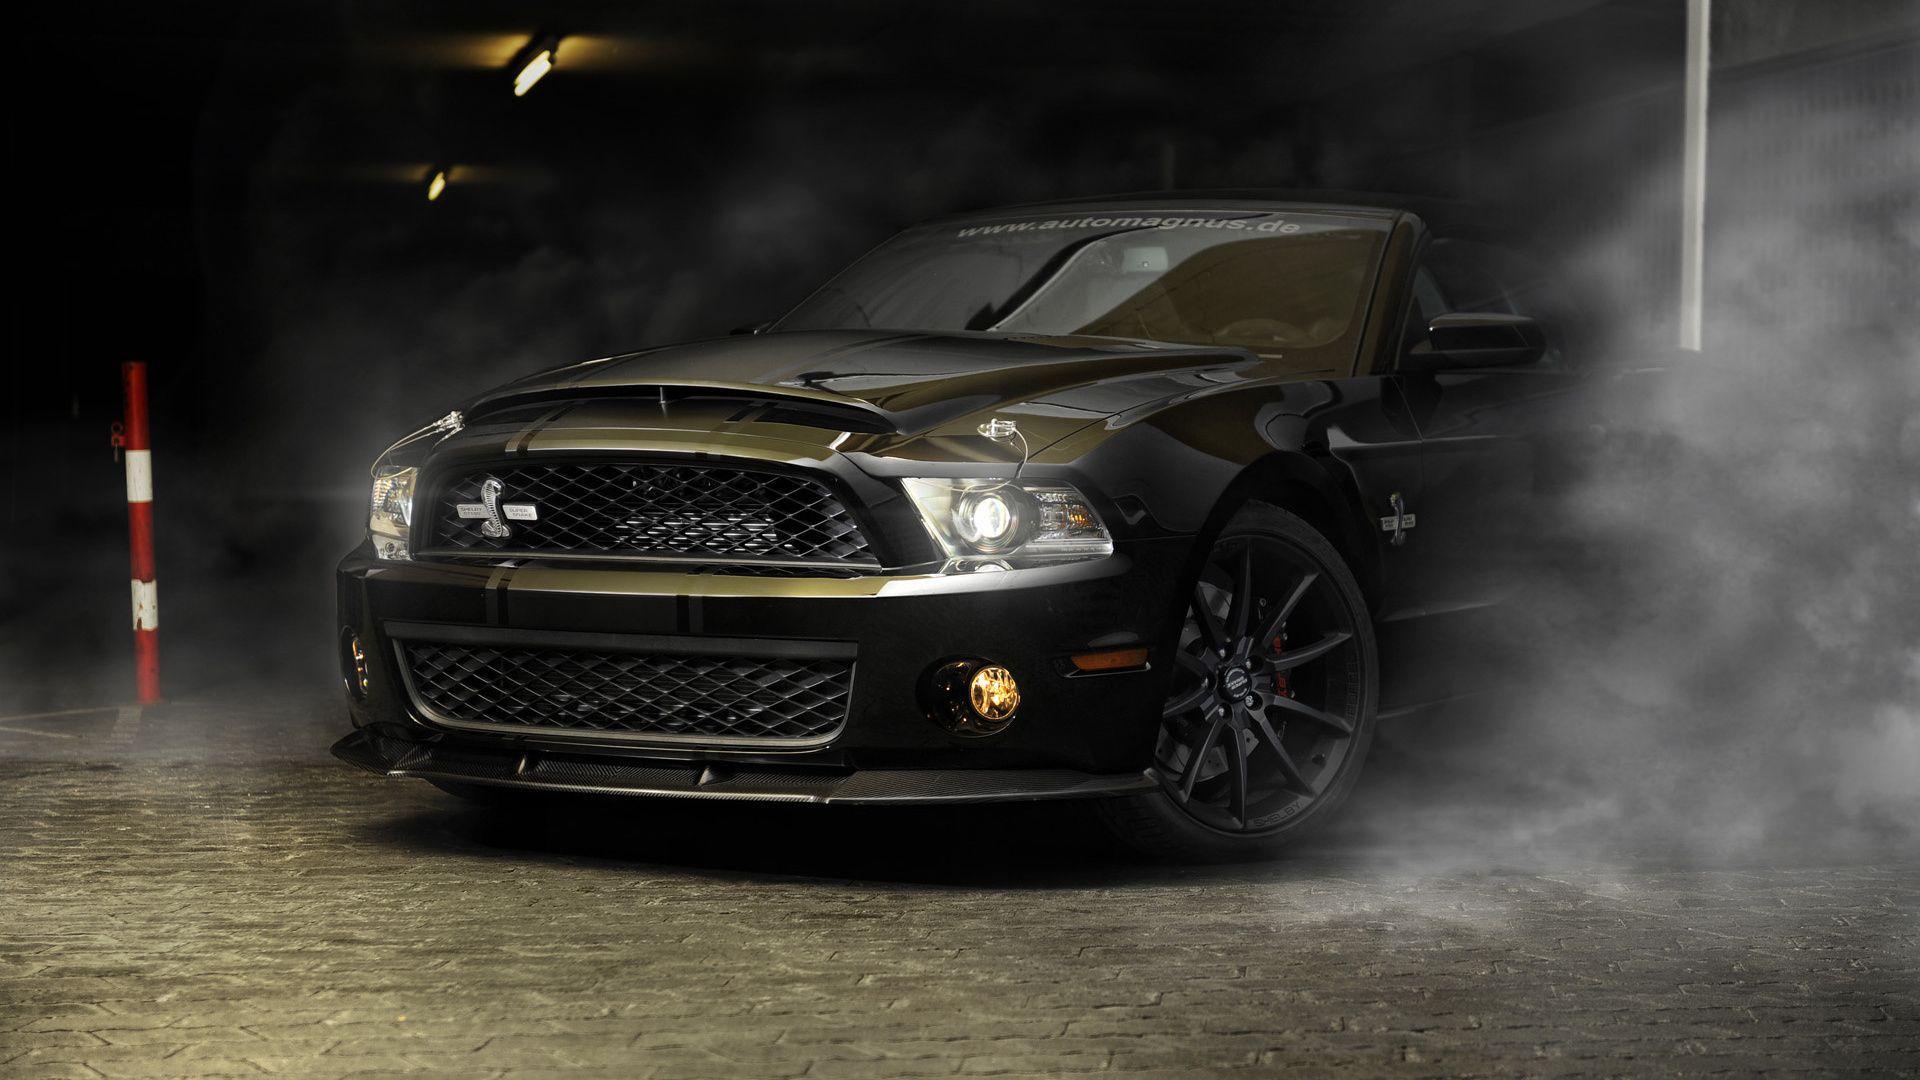 Mustang Car Wallpapers Top Free Mustang Car Backgrounds